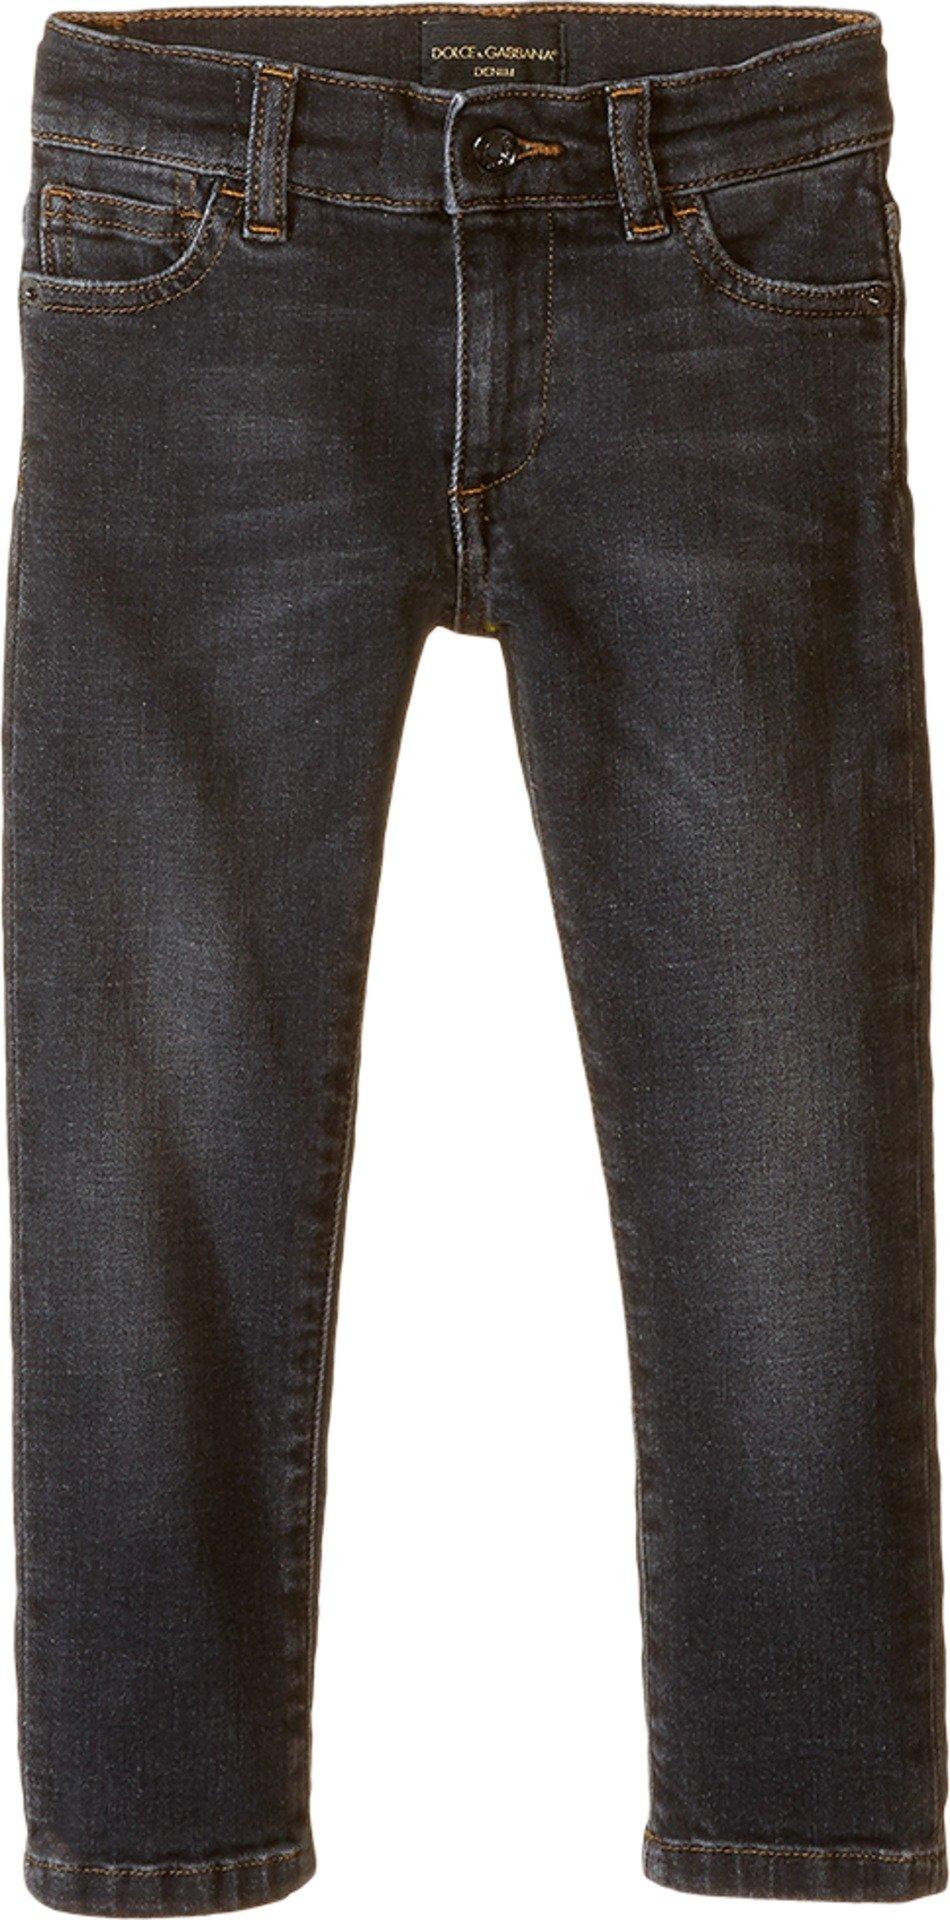 Dolce & Gabbana Kids Boys' Back To School Jeans (Little Kids), Grey Denim, 2T (Toddler) X One Size